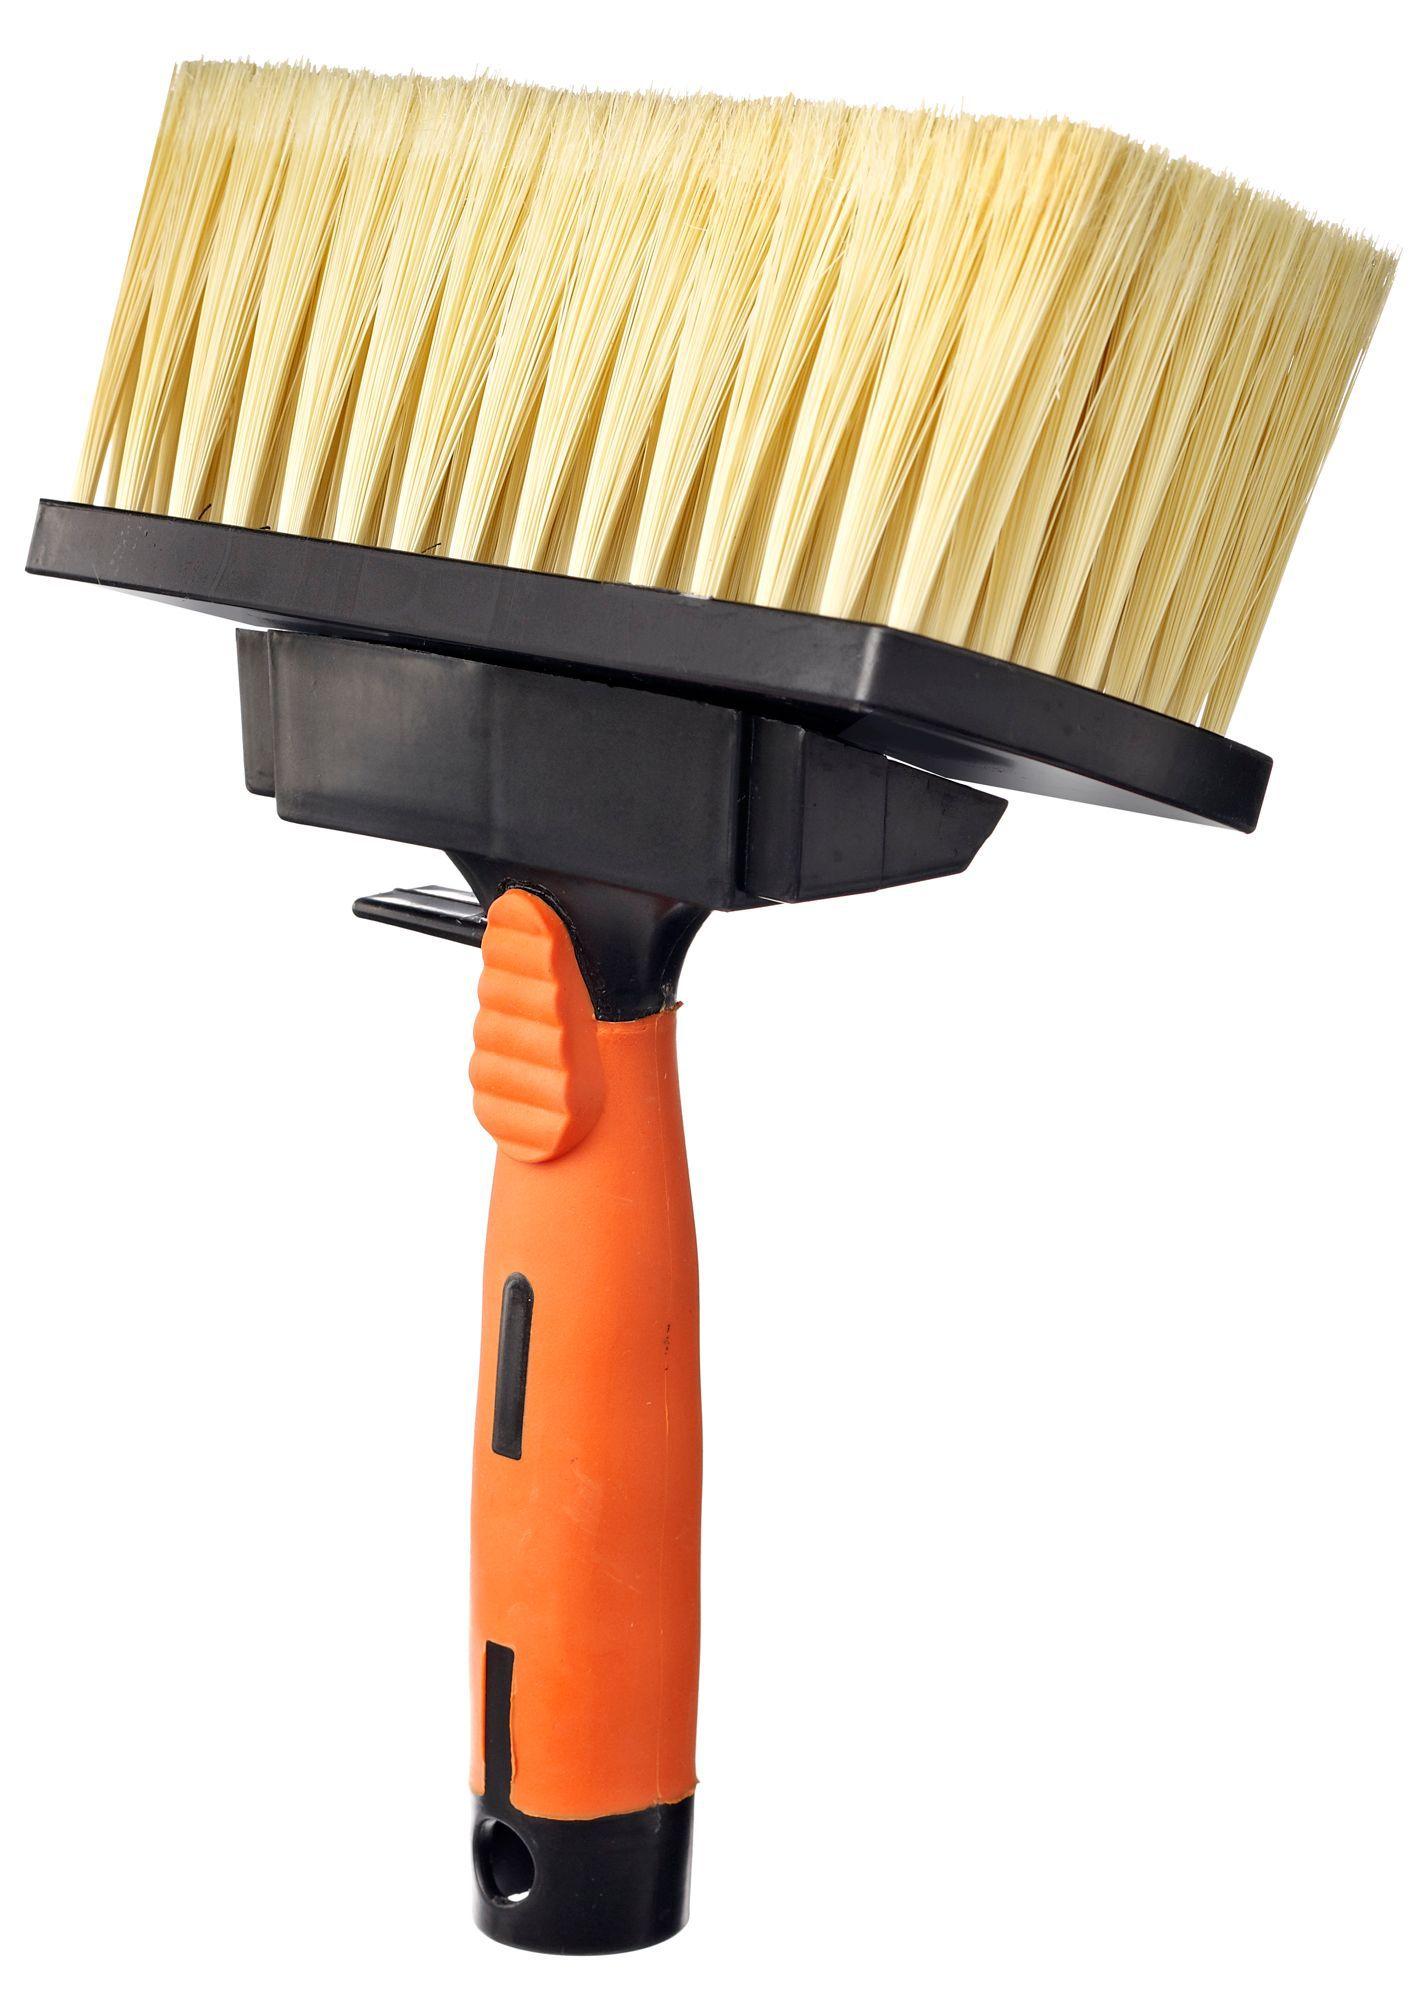 Diall Angled Head Jumbo Brush W 7 189 Quot Departments Diy